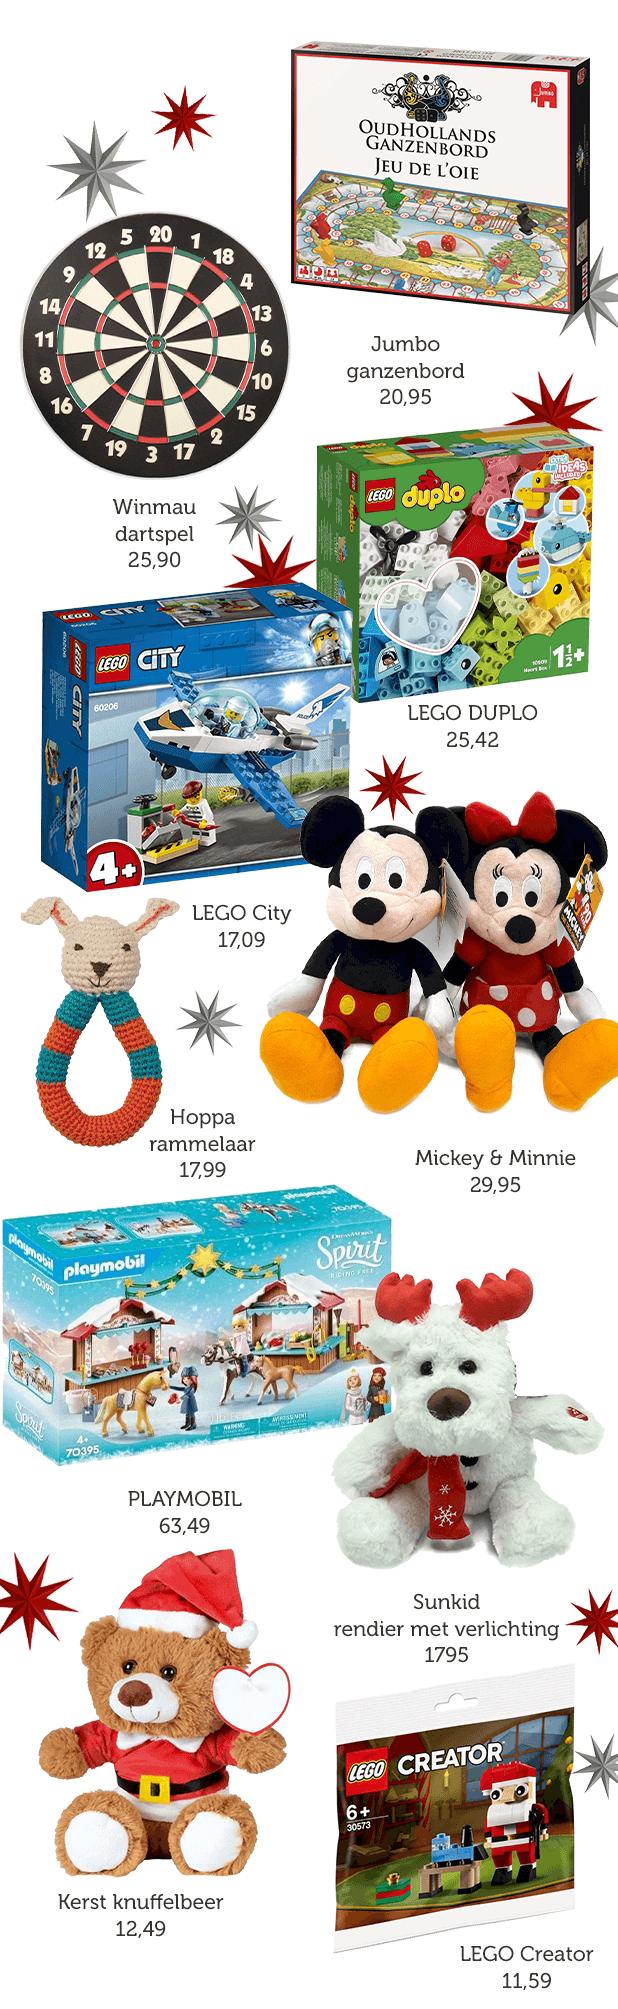 Shop nu het leukste speelgoed!